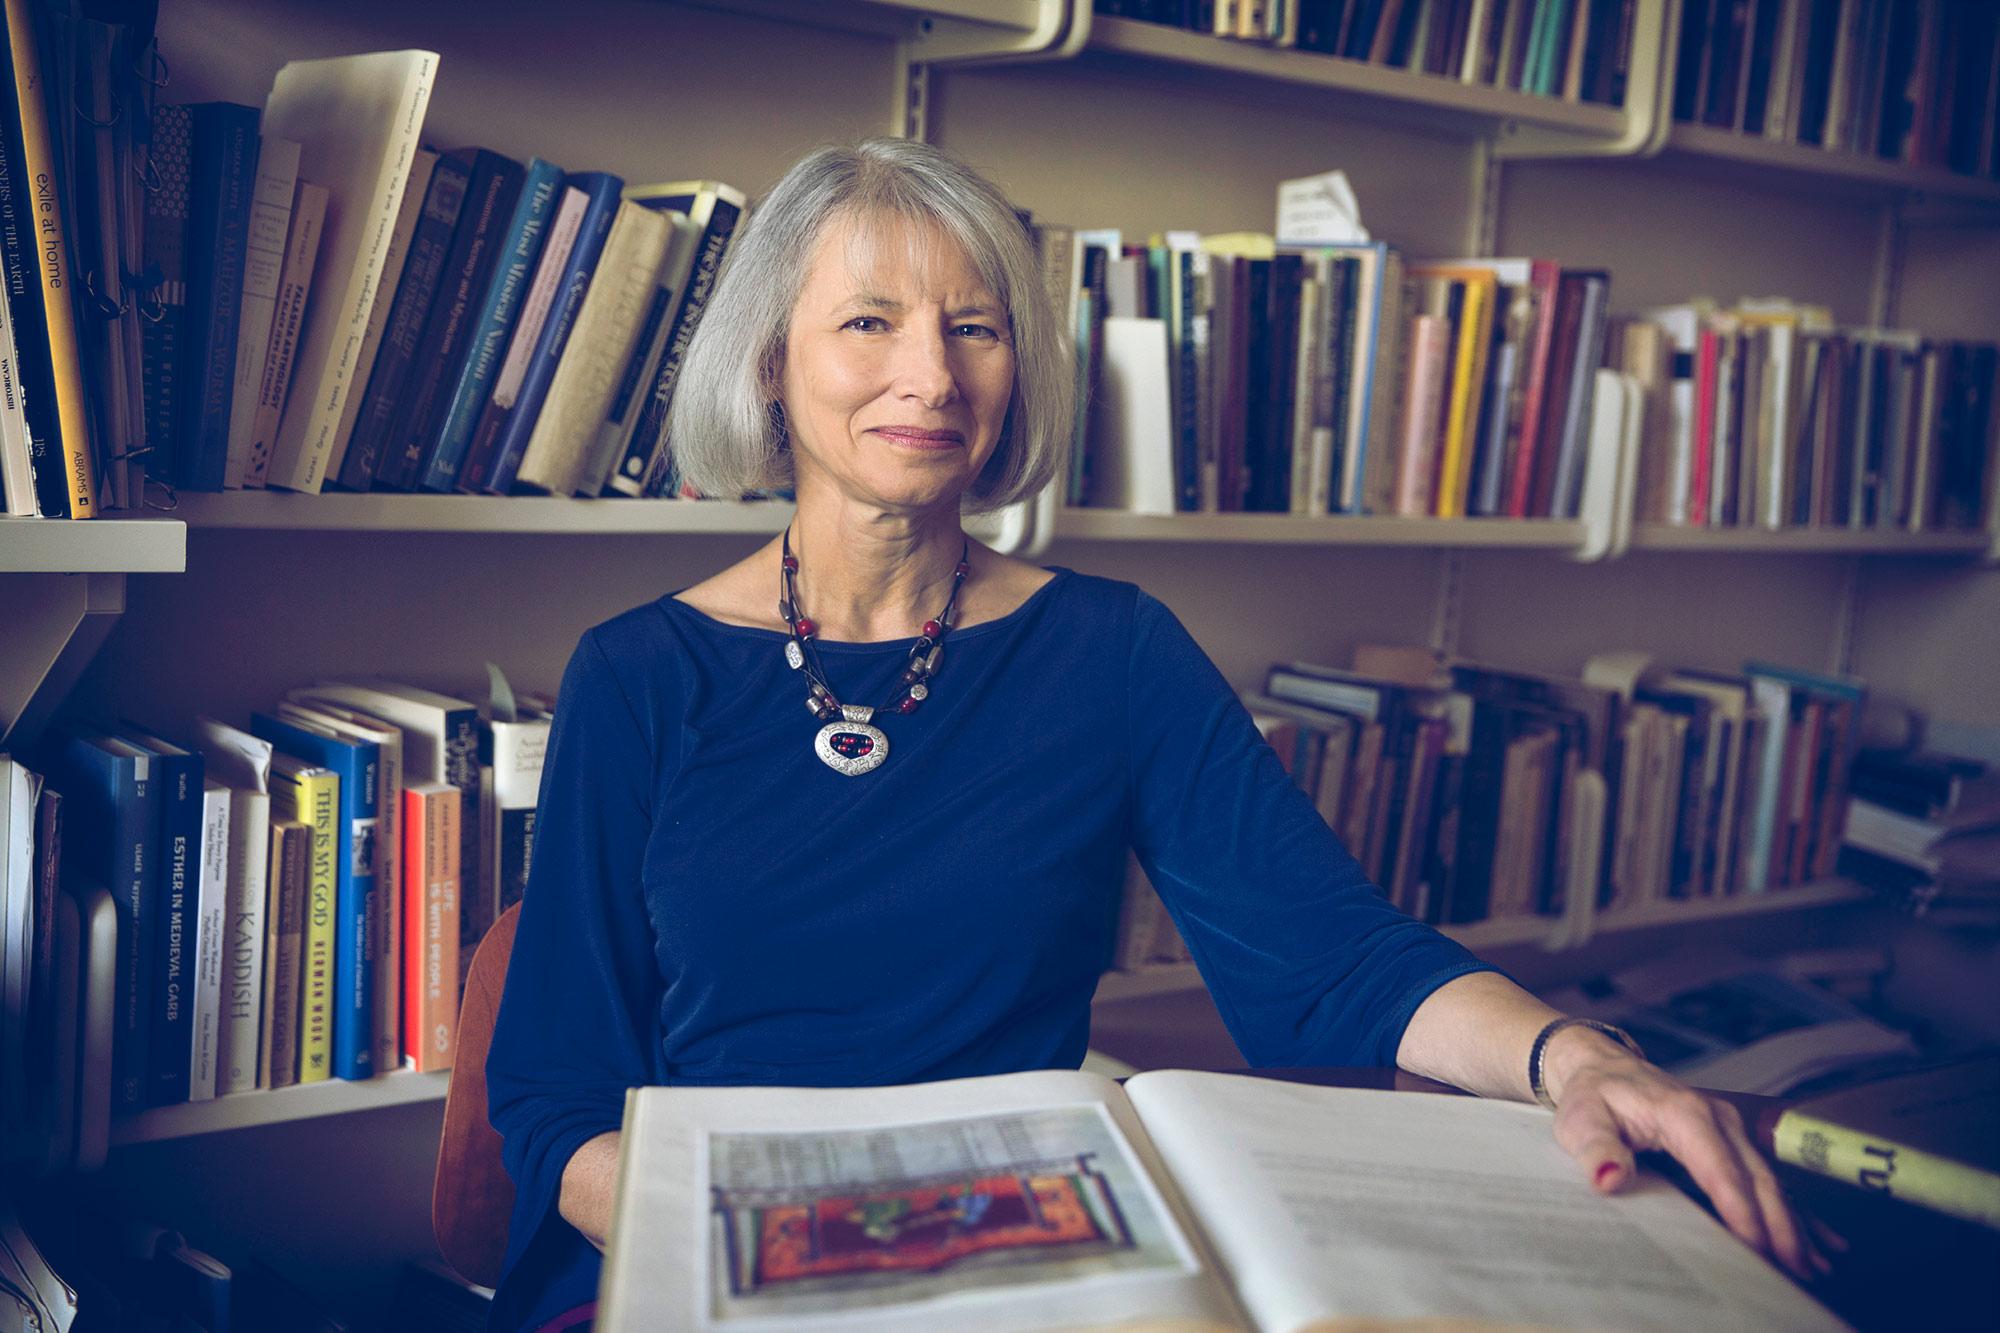 Vanessa Ochs teaches classes on religious ritual and the practice of Judaism in UVA's Department of Religious Studies.